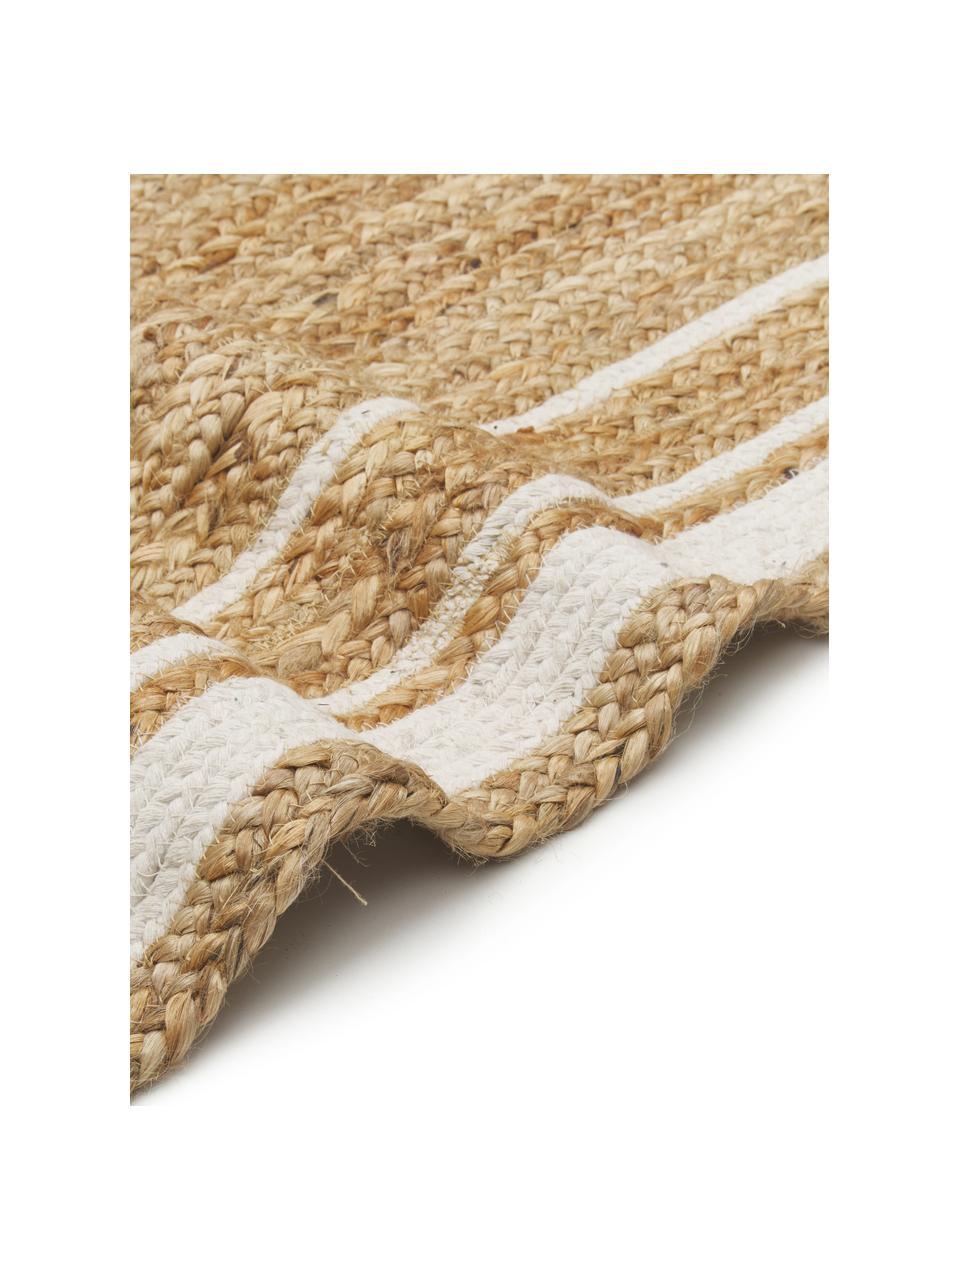 Tappeto in juta tessuto a mano Clover, 100% juta, Beige, bianco, Larg. 80 x Lung. 150 cm (taglia XS)